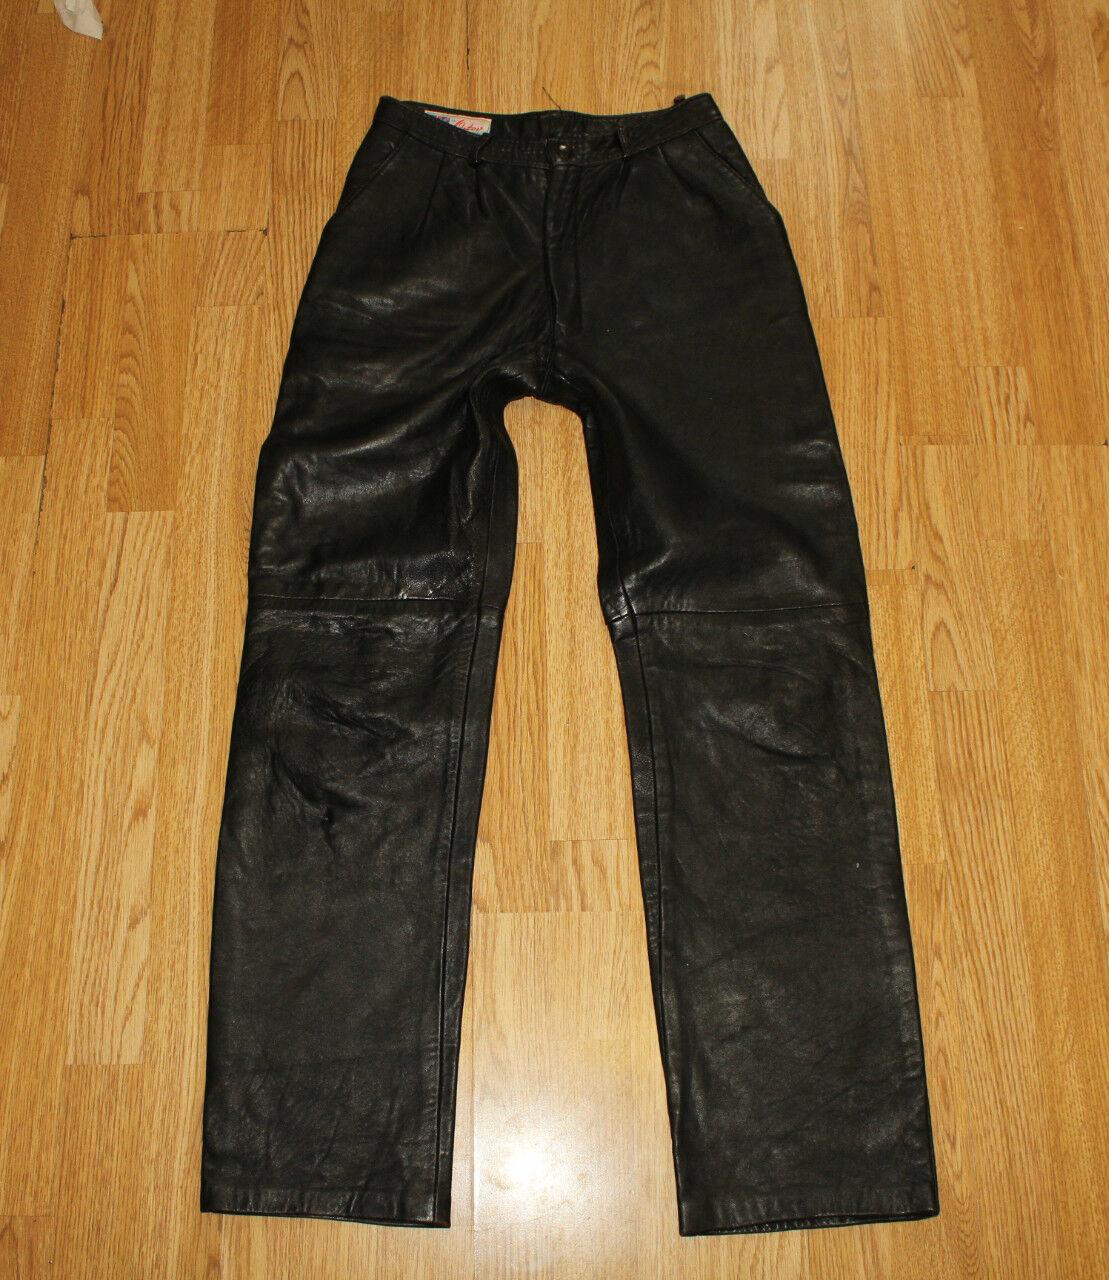 Brown Leather ORTOV Zip High Waist Tapered Biker Jeans Trousers Pants Sz 28 L 30